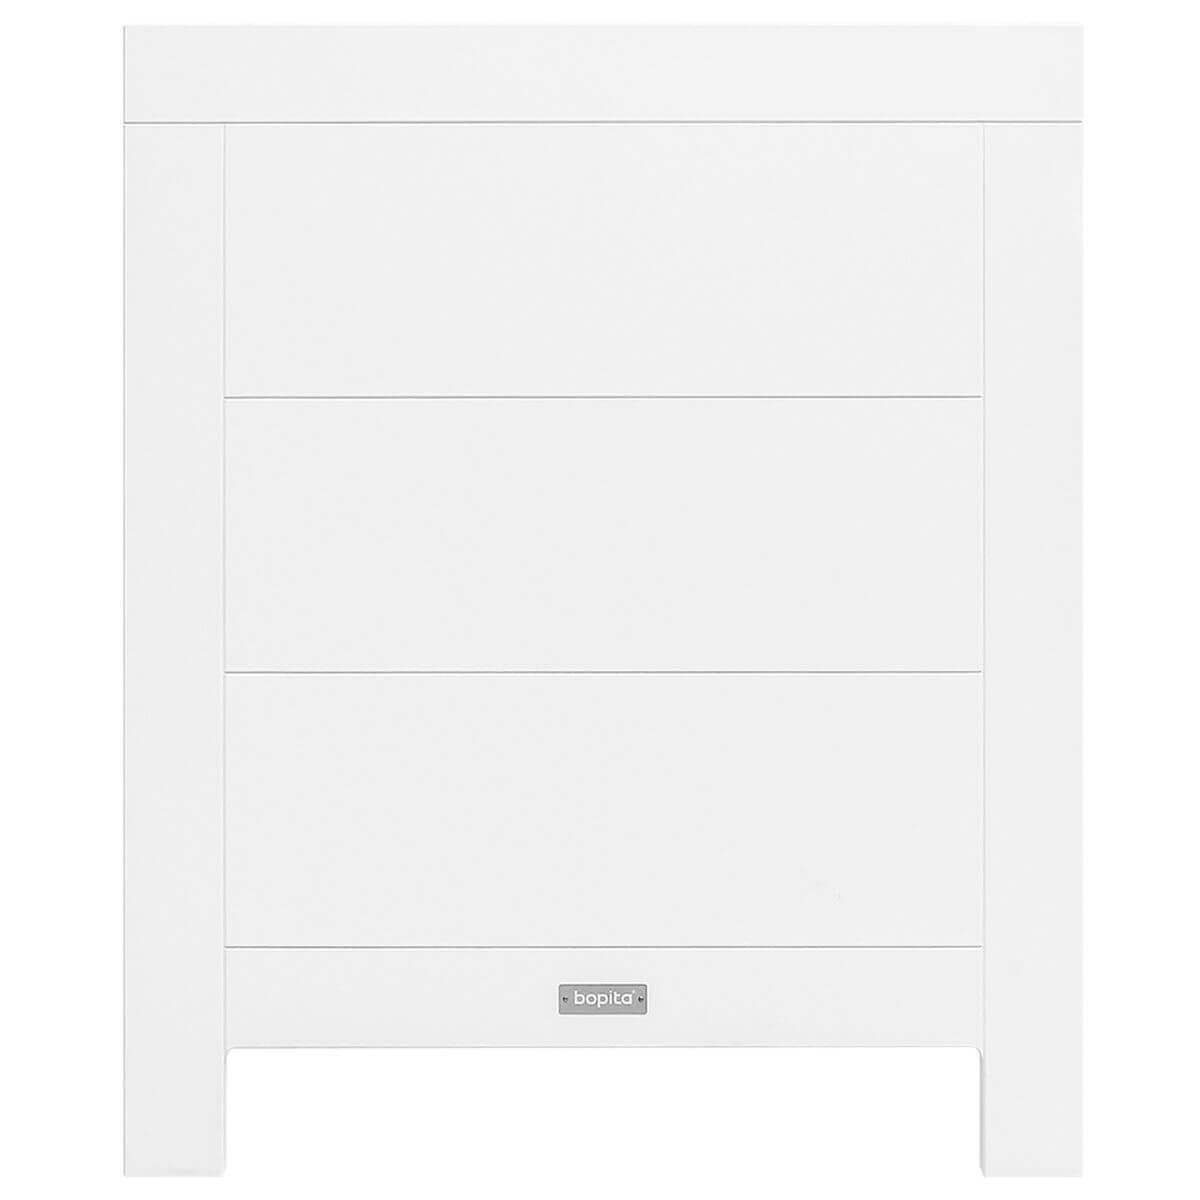 Lit 60x120cm LUCCA Bopita blanc